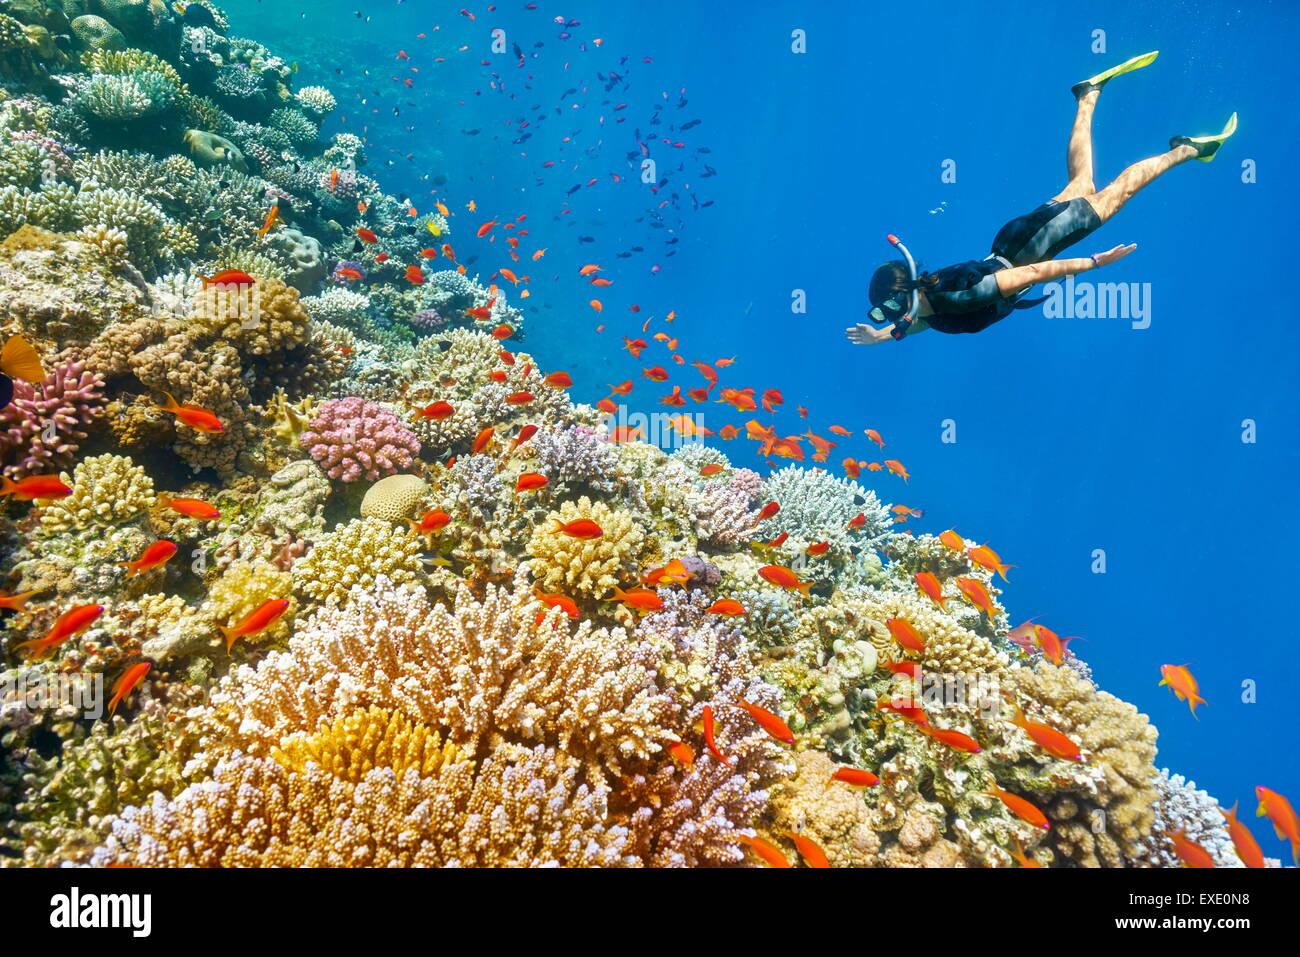 Mar Rojo, Egipto - mujer buceo submarino, arrecifes de coral, cerca de Blue Hole Dahab Imagen De Stock